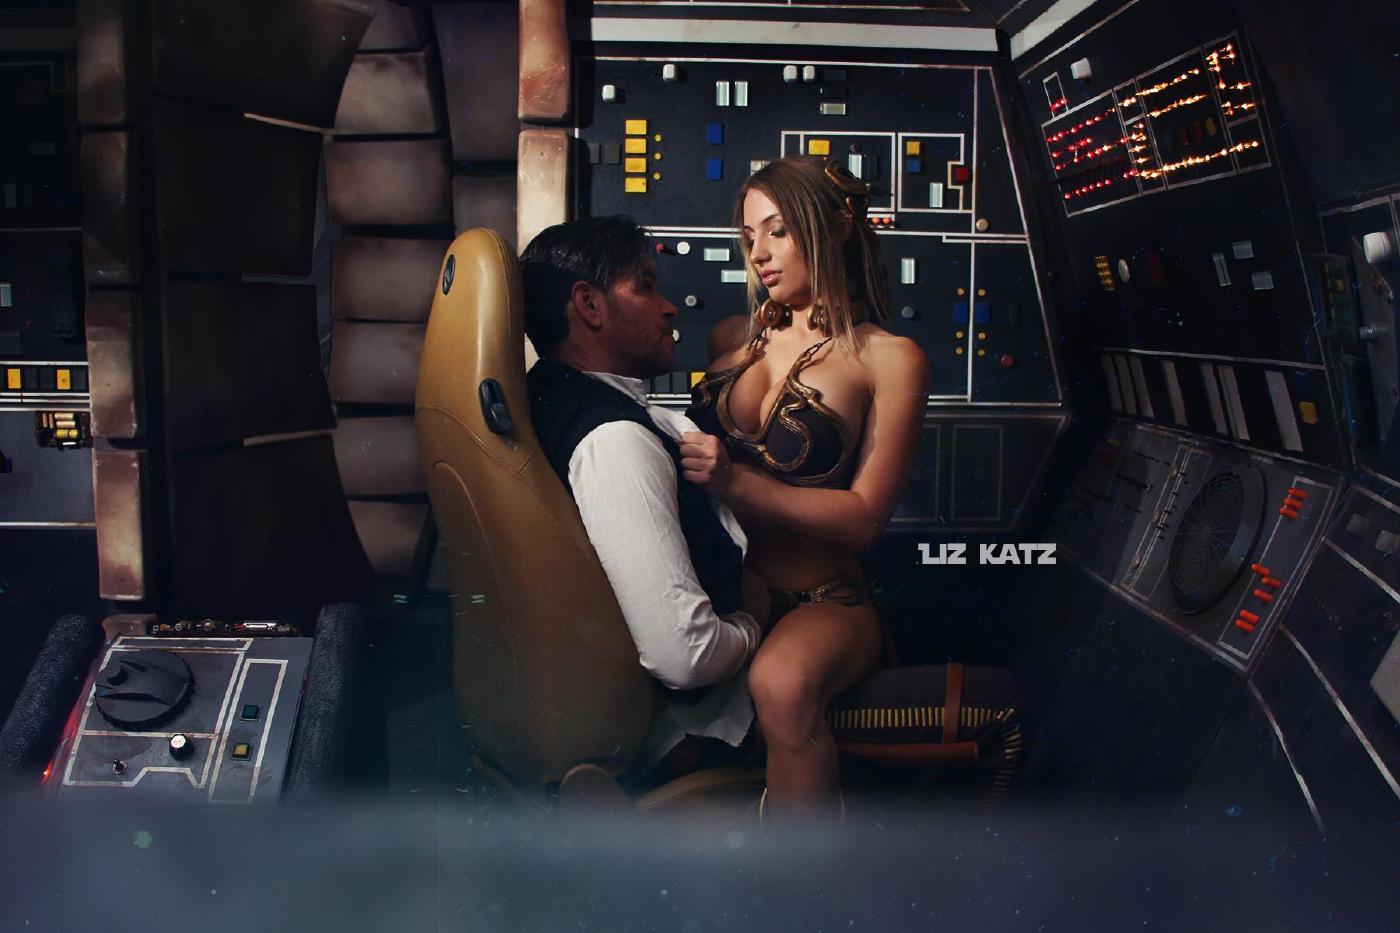 Liz Katz Slave Leia Nude Cosplay Onlyfans Leaked Photos 25